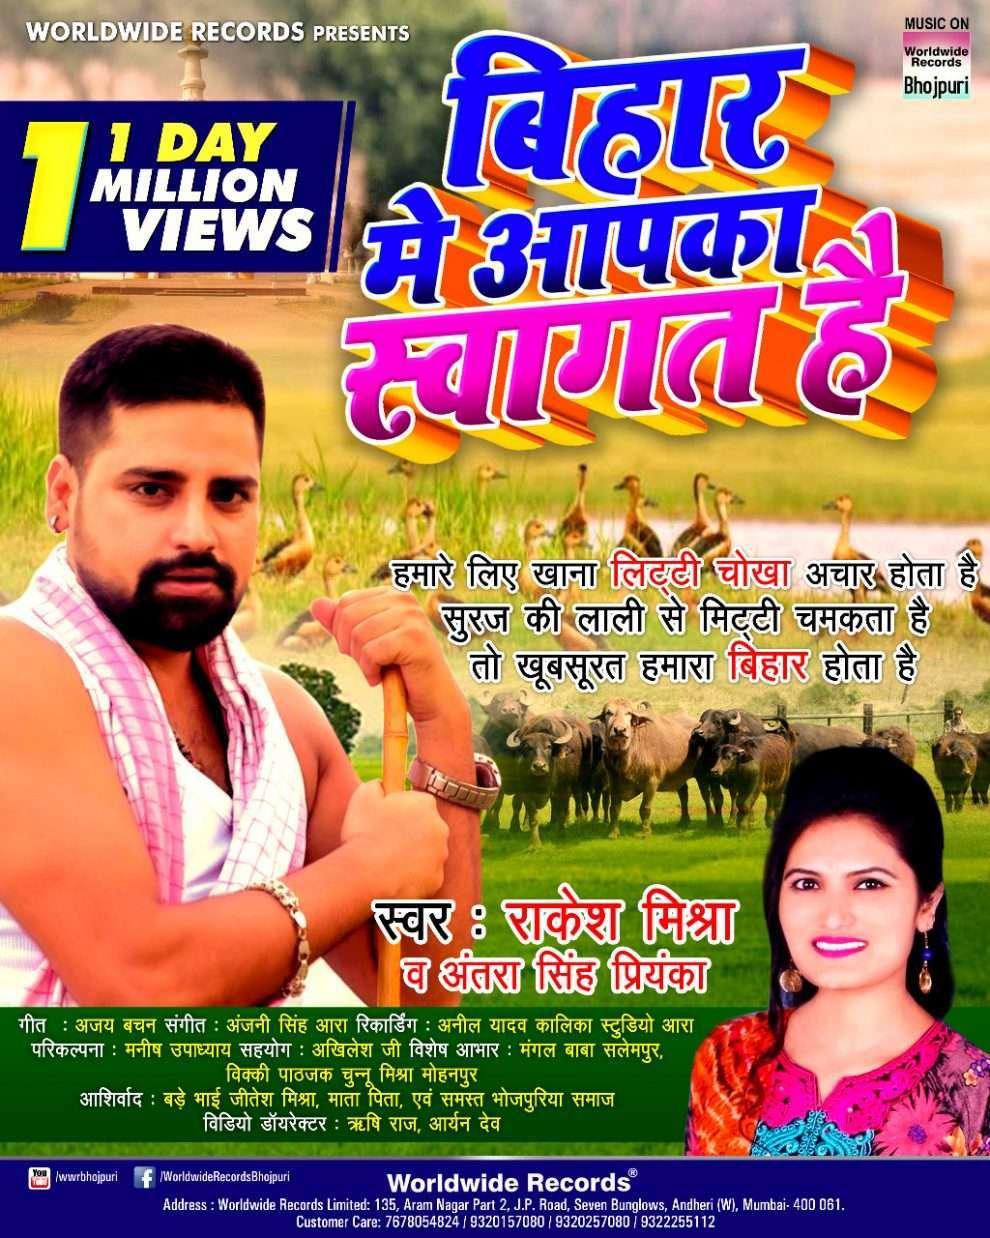 Bihar Mein Aapka Swagat Hai|BIHAR NO 1